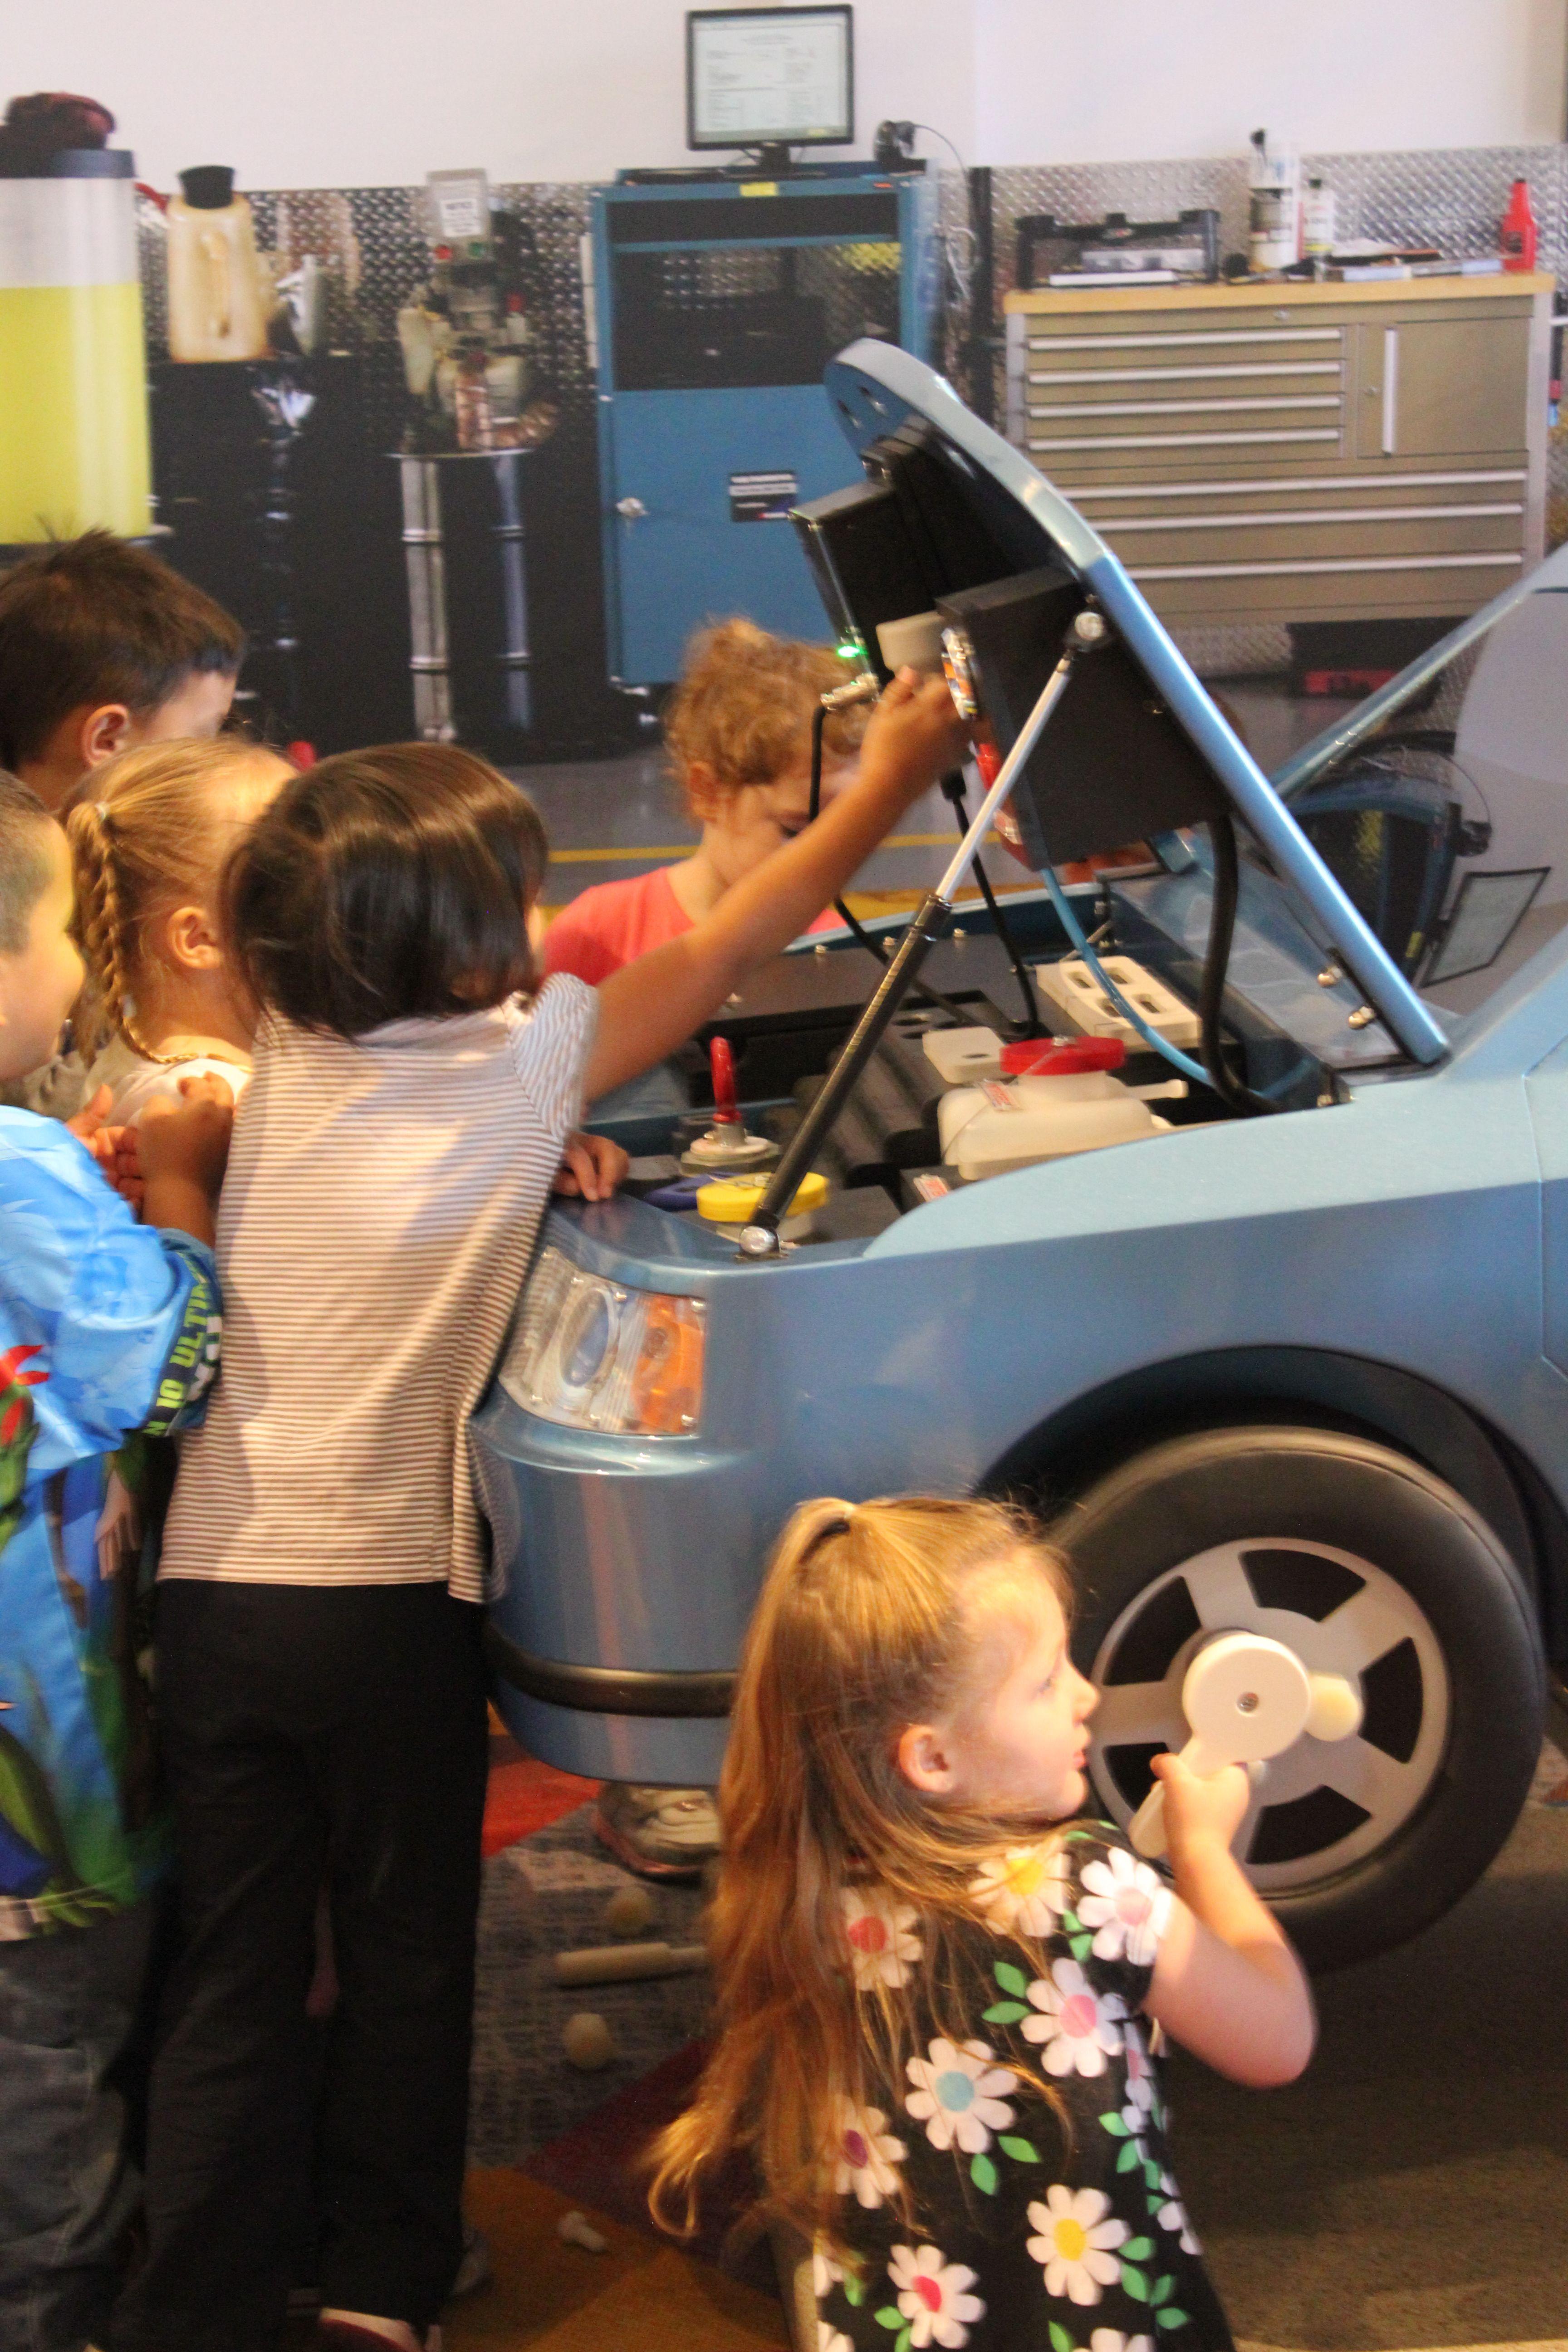 children u2019s museum exhibit the auto care center is a